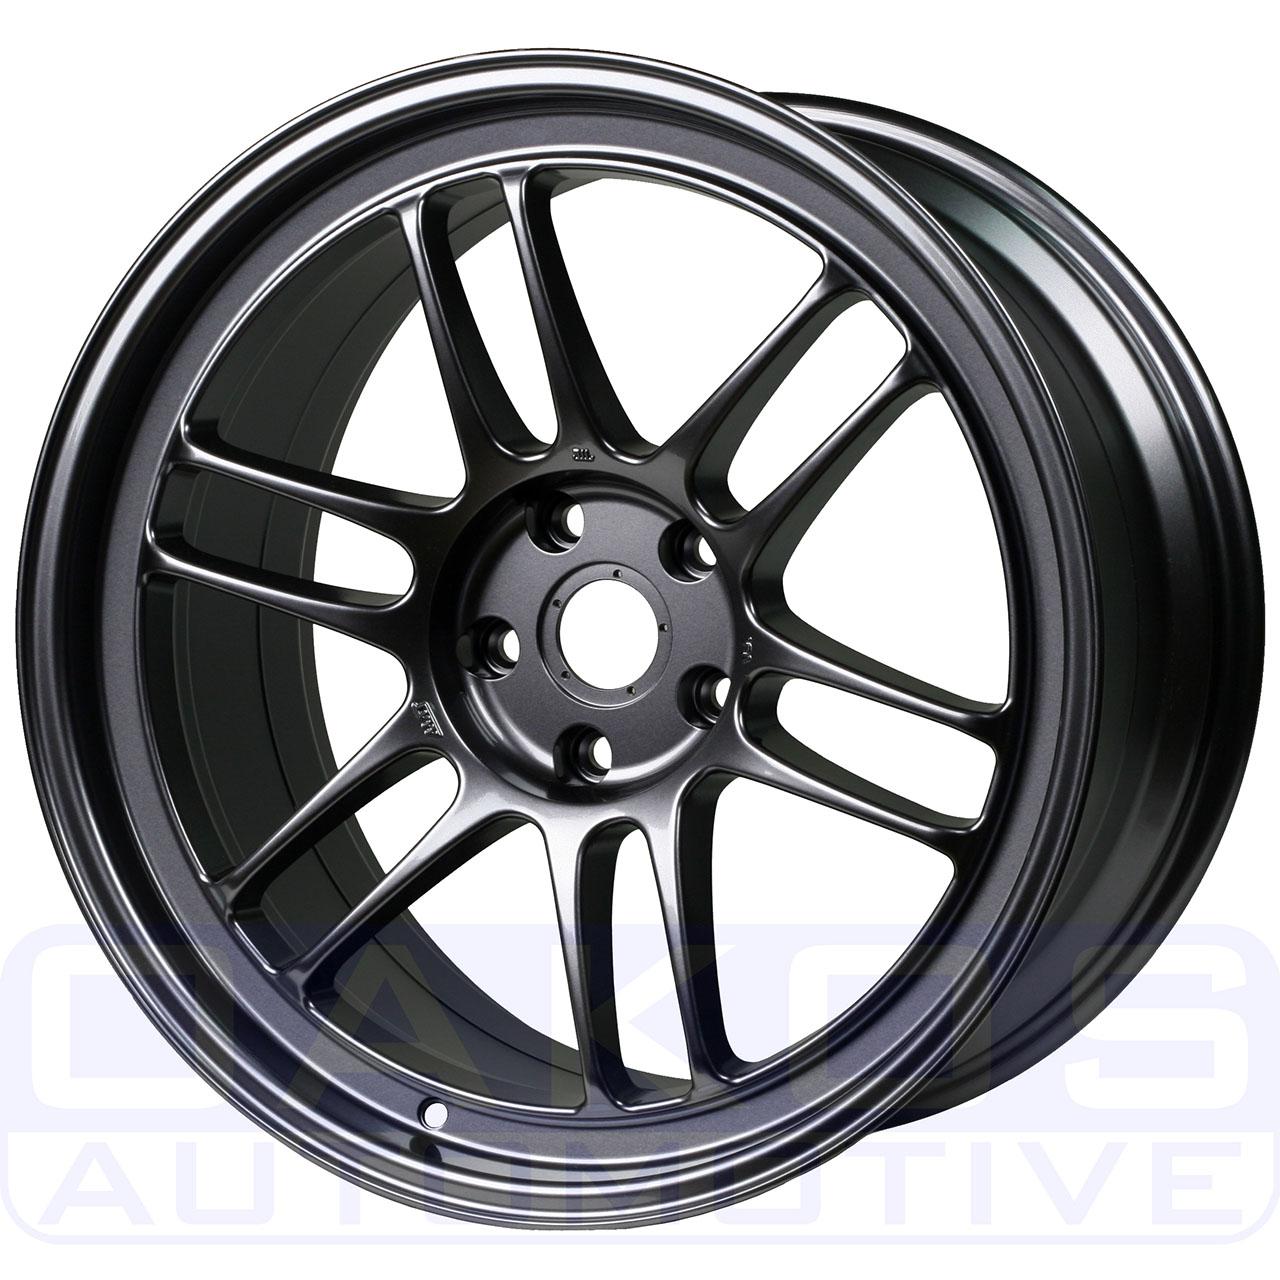 Black Rpf1 17x9 Enkei Rpf1 Wheels 17x9